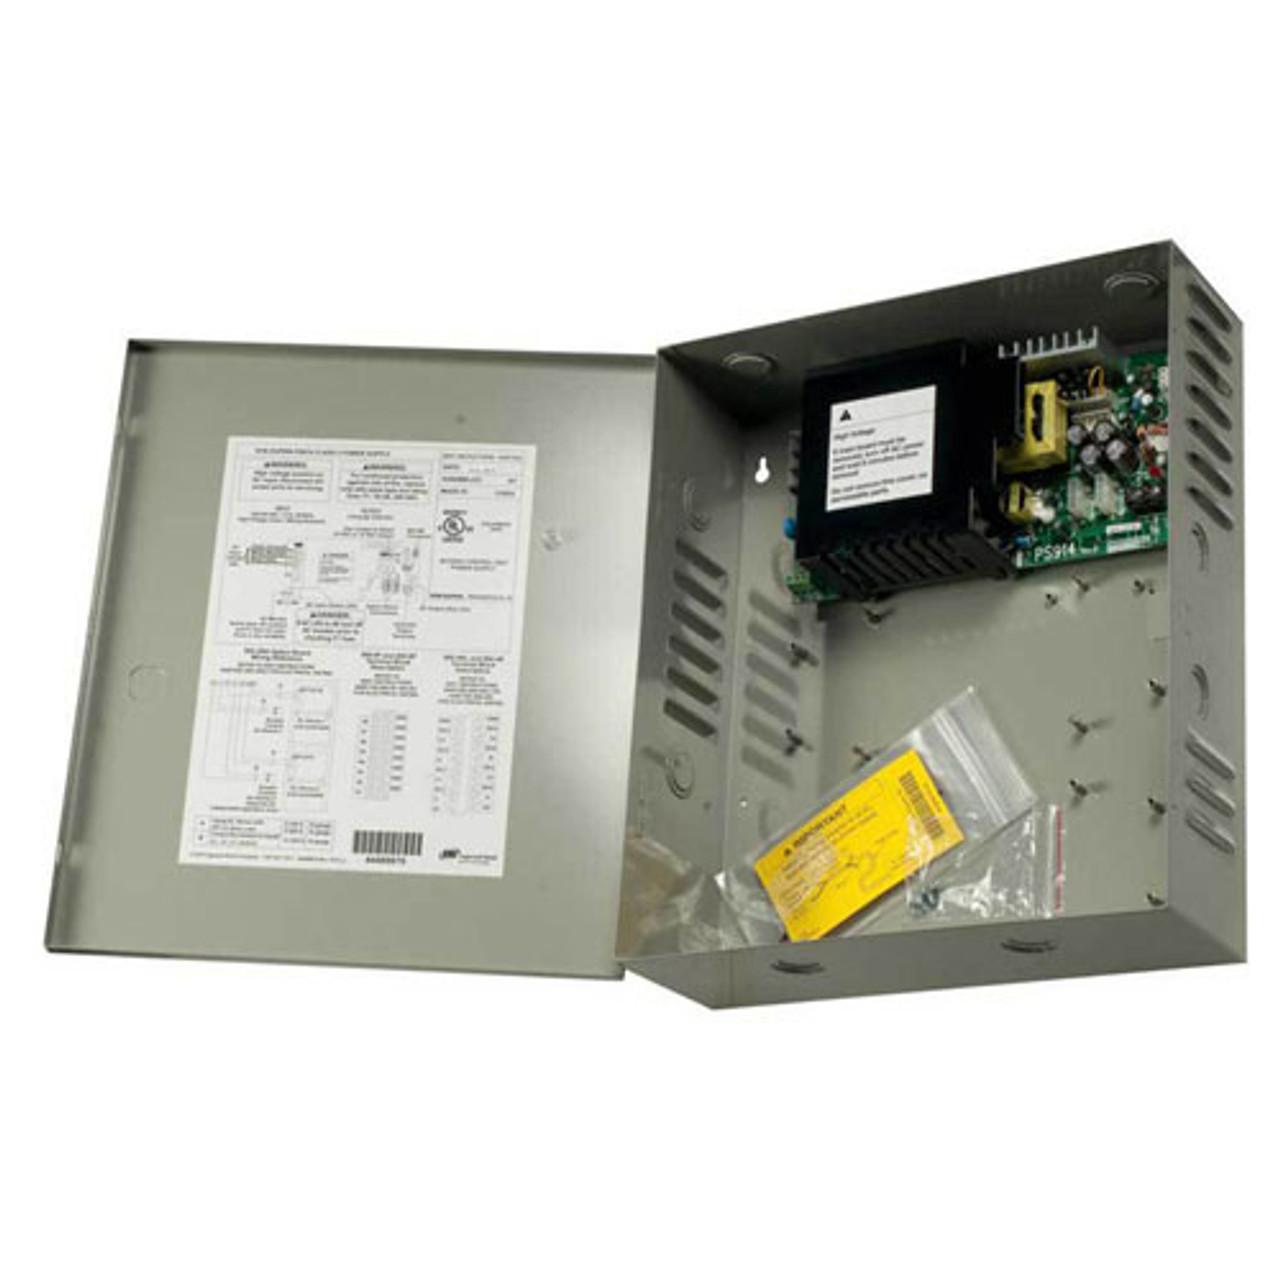 small resolution of ps914 von duprin power supply lock depot incps914 wiring diagram 9